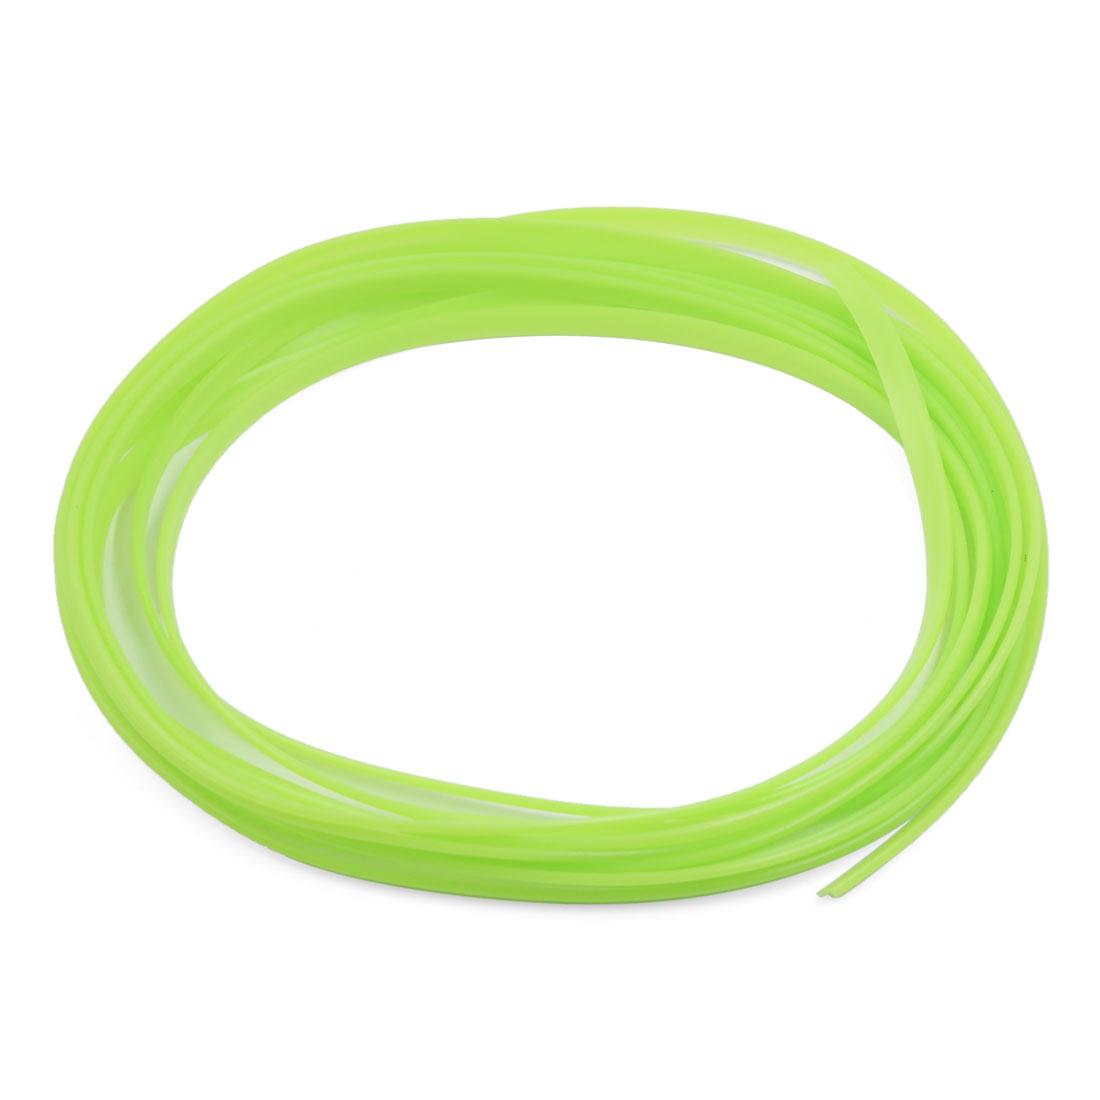 5M Fluorescence Green Flexible Trim Car Interior Exterrior Moulding Strip